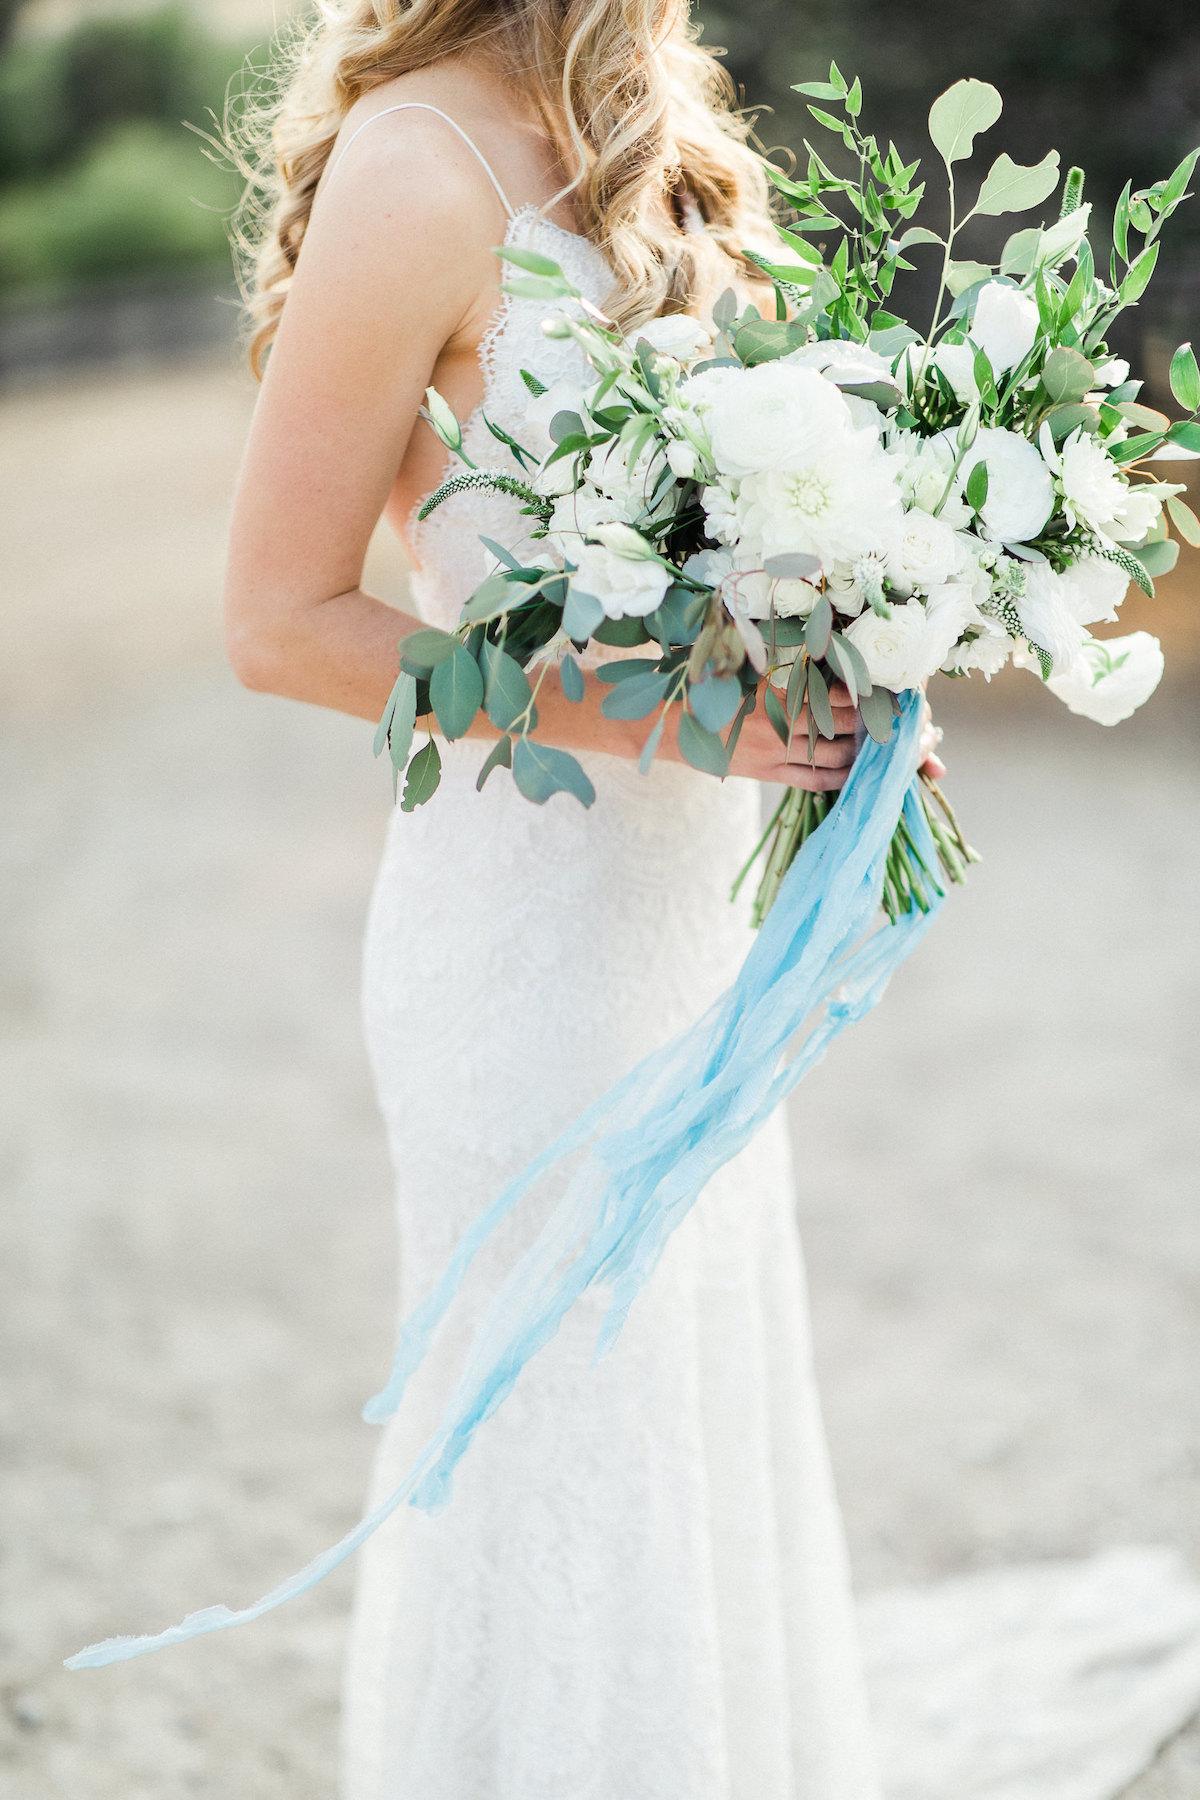 San-Luis-Obispo-Wedding-Paso-Robles-Ashley-Rae-Studio.jpg